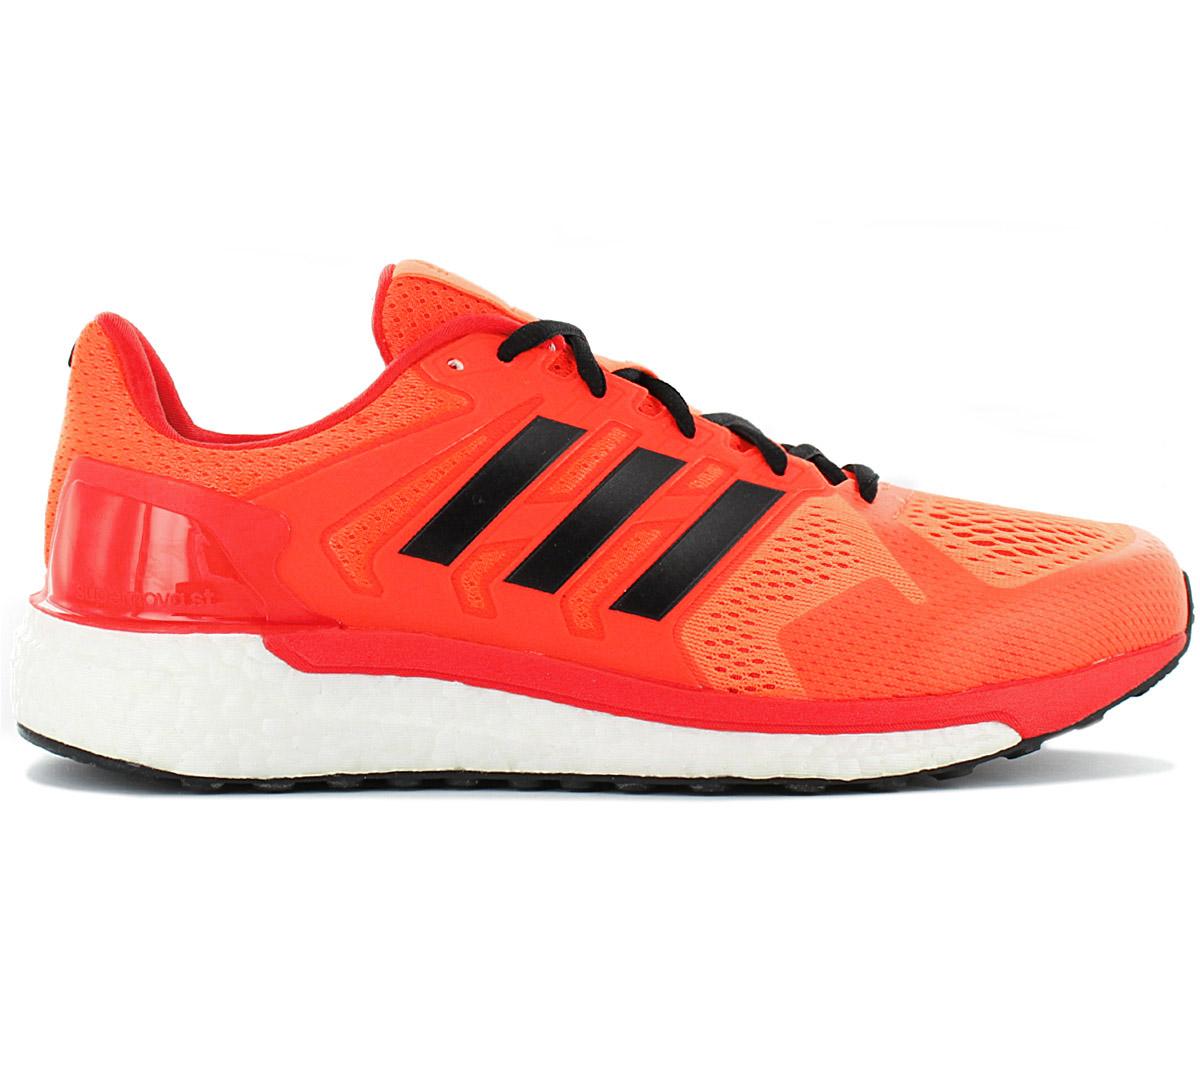 fbf176e3cac8a Adidas Supernova st M Boost Men s Running Shoes Cg4029 Running ...